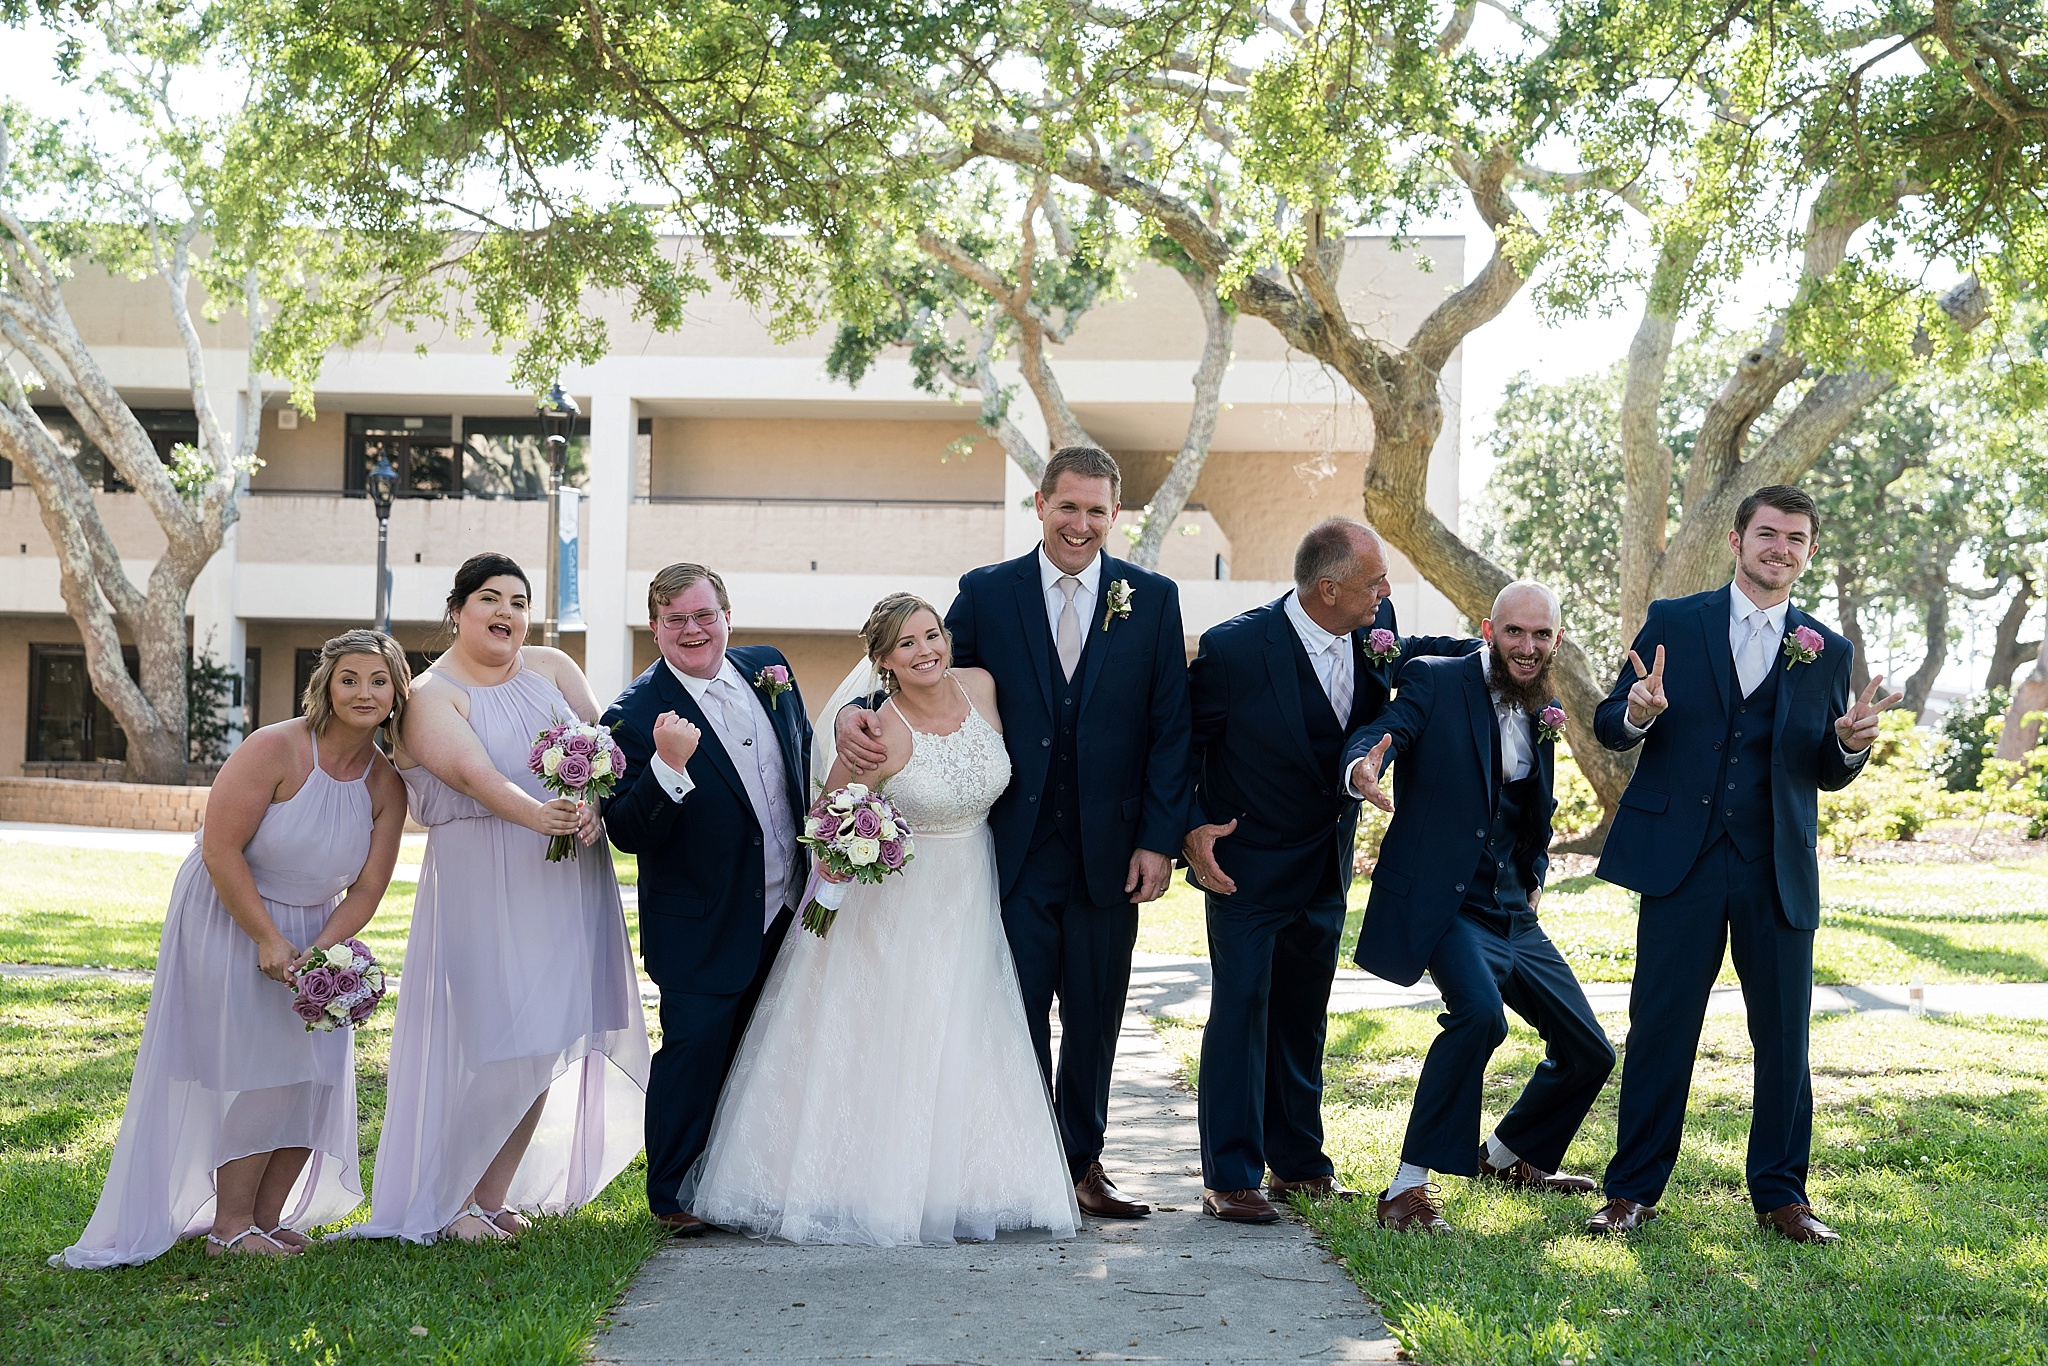 Crystal-Coast-Wedding-Photographer-026.jpg